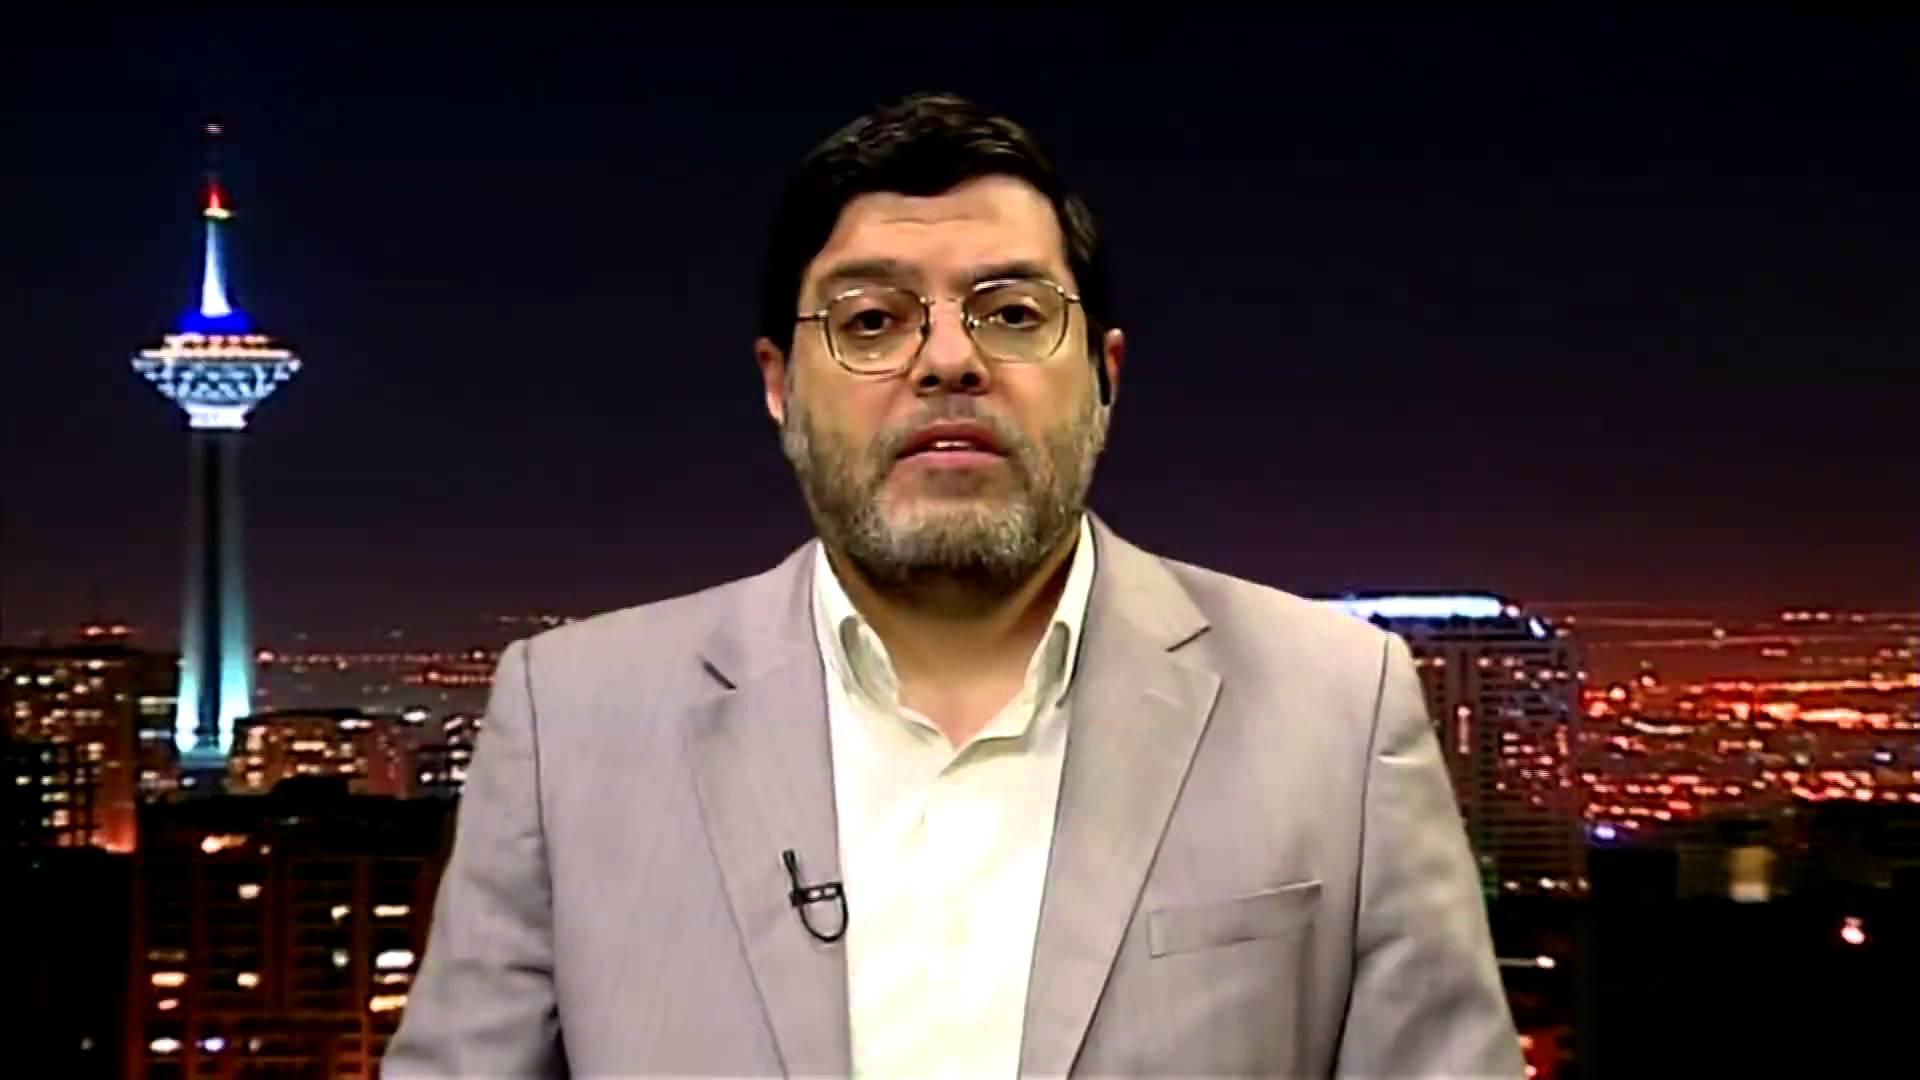 Iran capable of maintaining democratic values: Academic